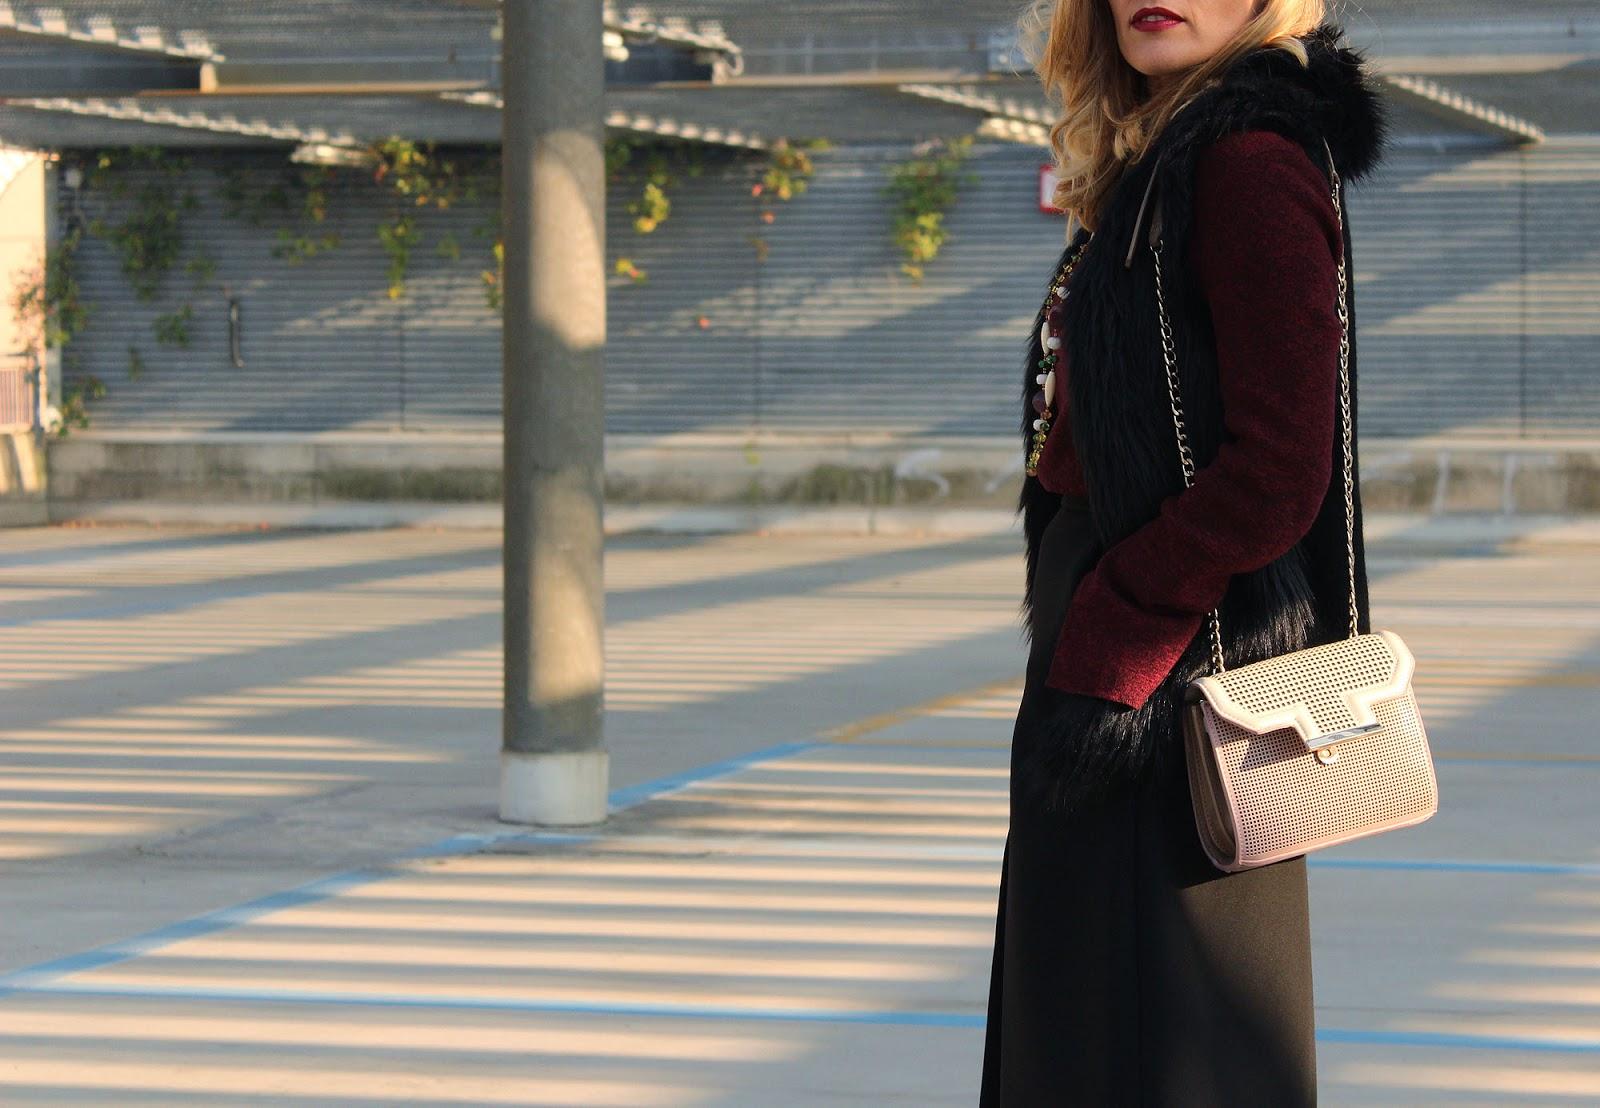 Eniwhere Fashion - Midi skirt e stringate ootd